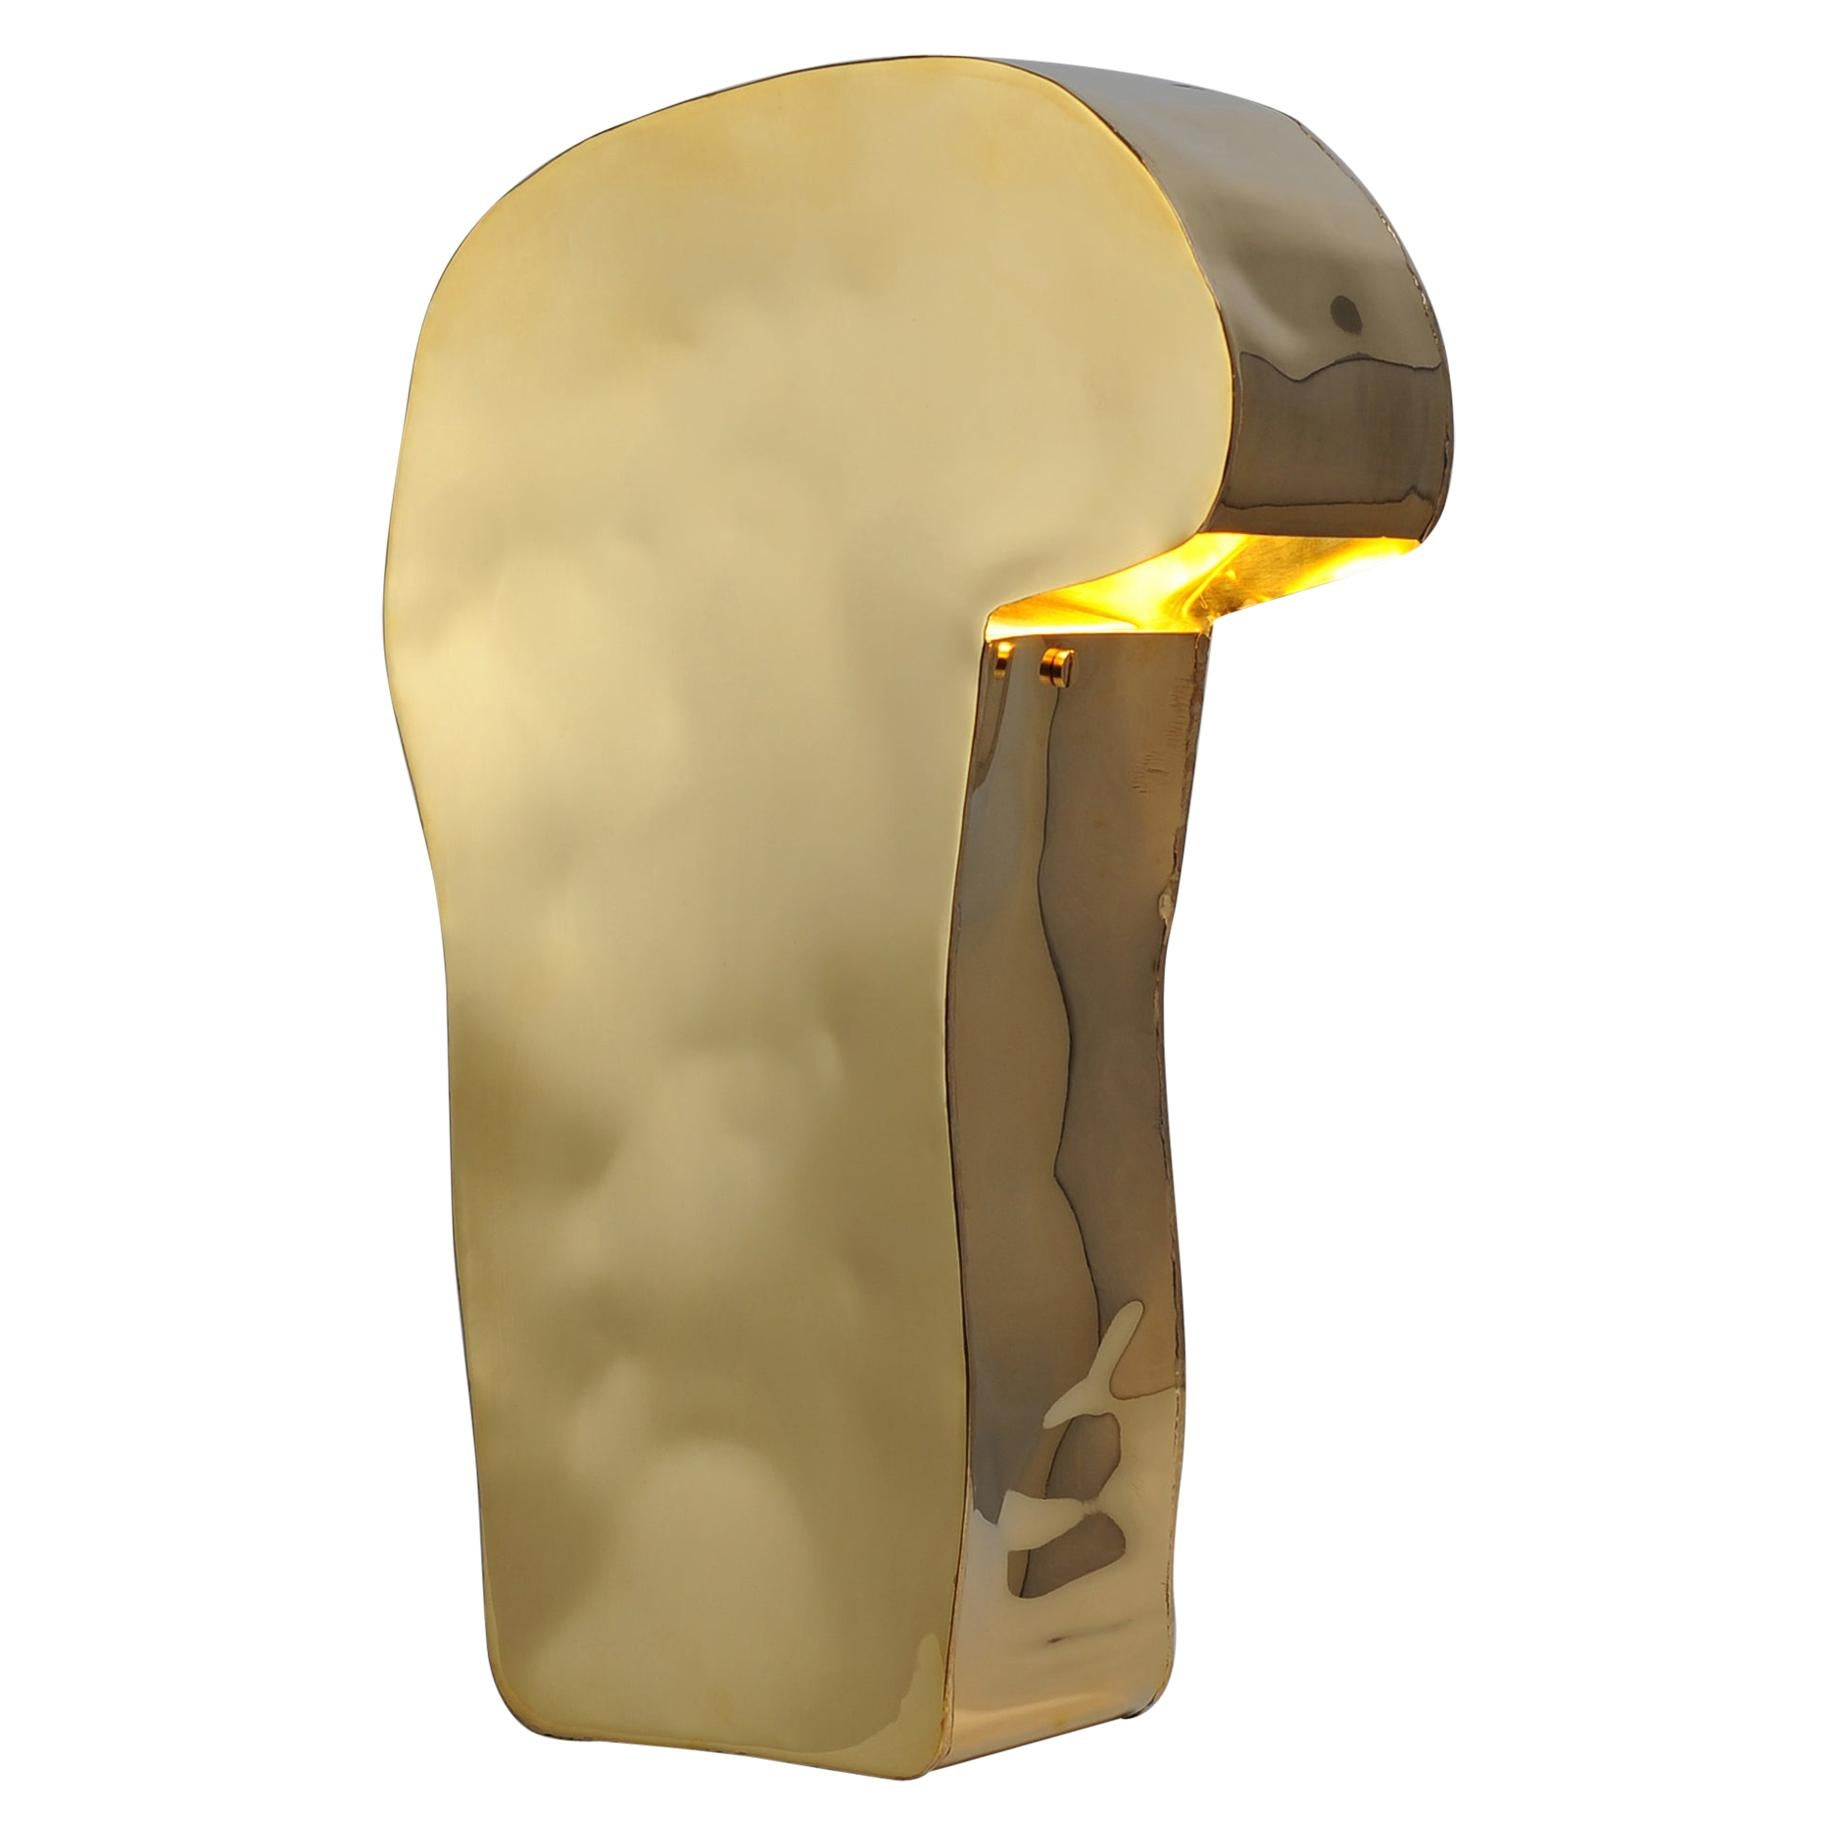 Primitive Brass Table Lamp, Signed by Lukasz Friedrich